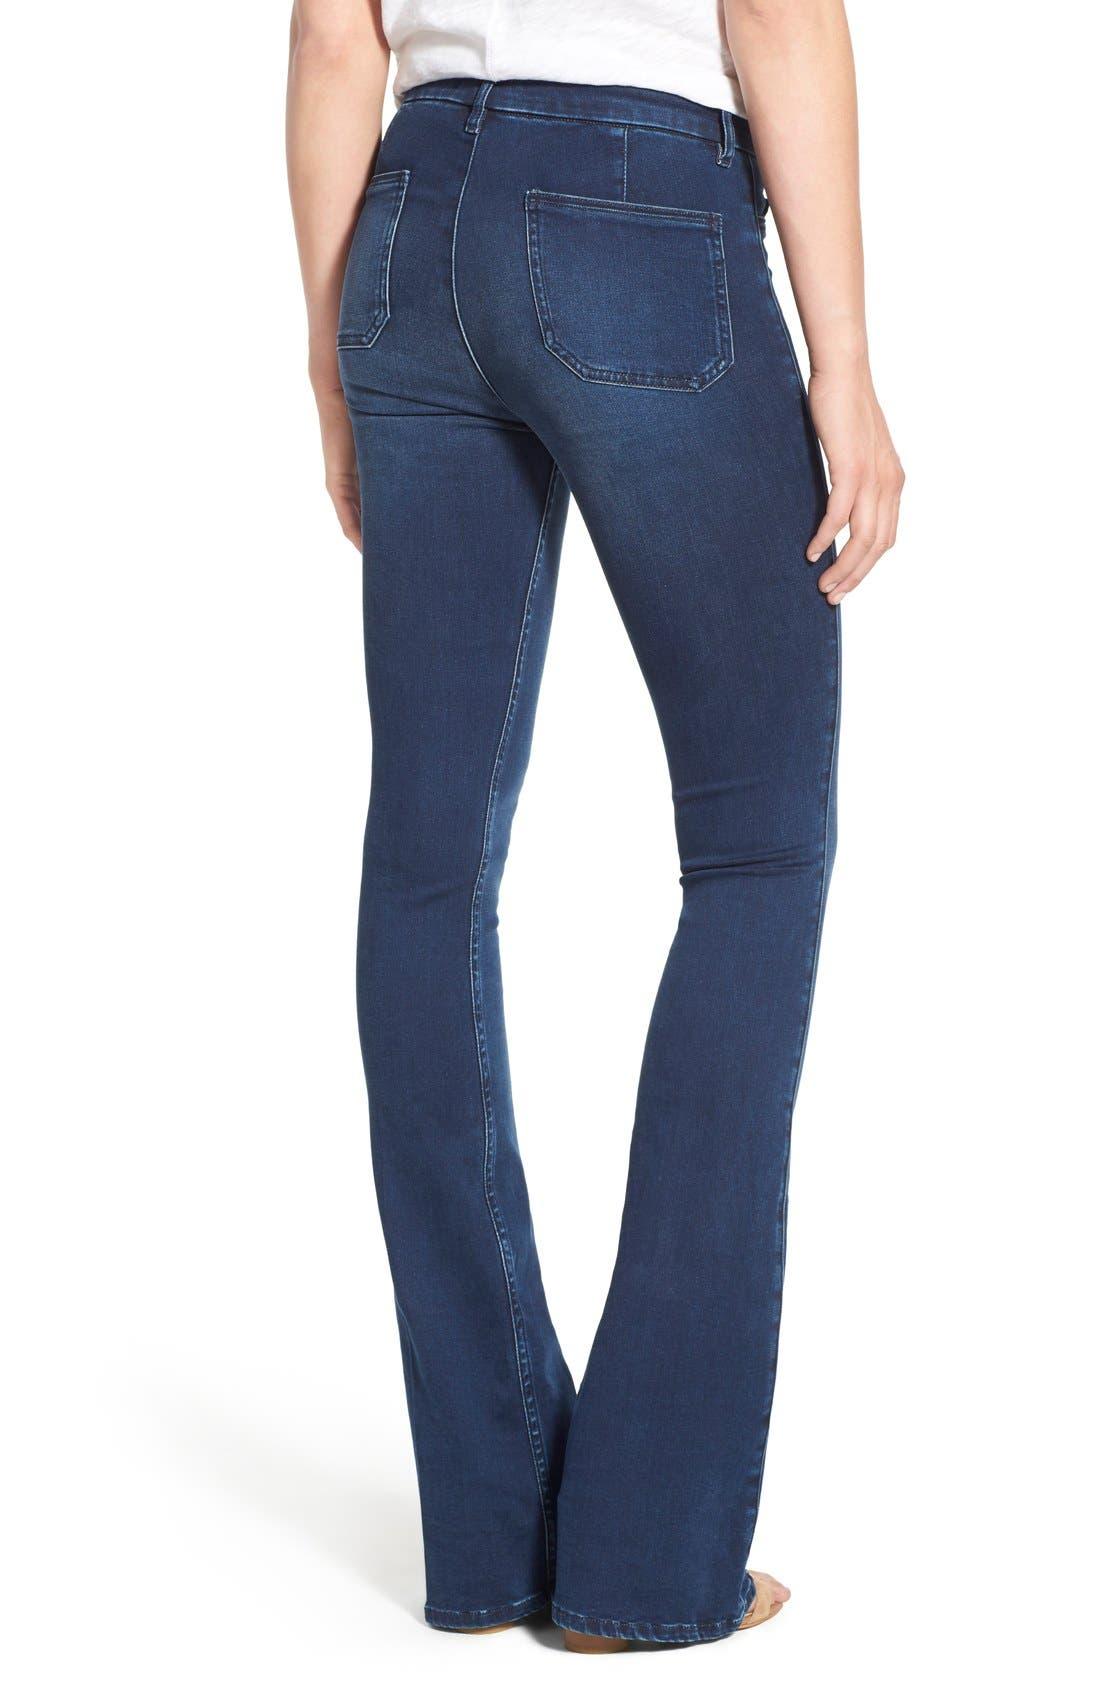 Alternate Image 2  - M.i.h. Jeans 'Superfit Marrakesh' Flare Jeans (Circle Blue)